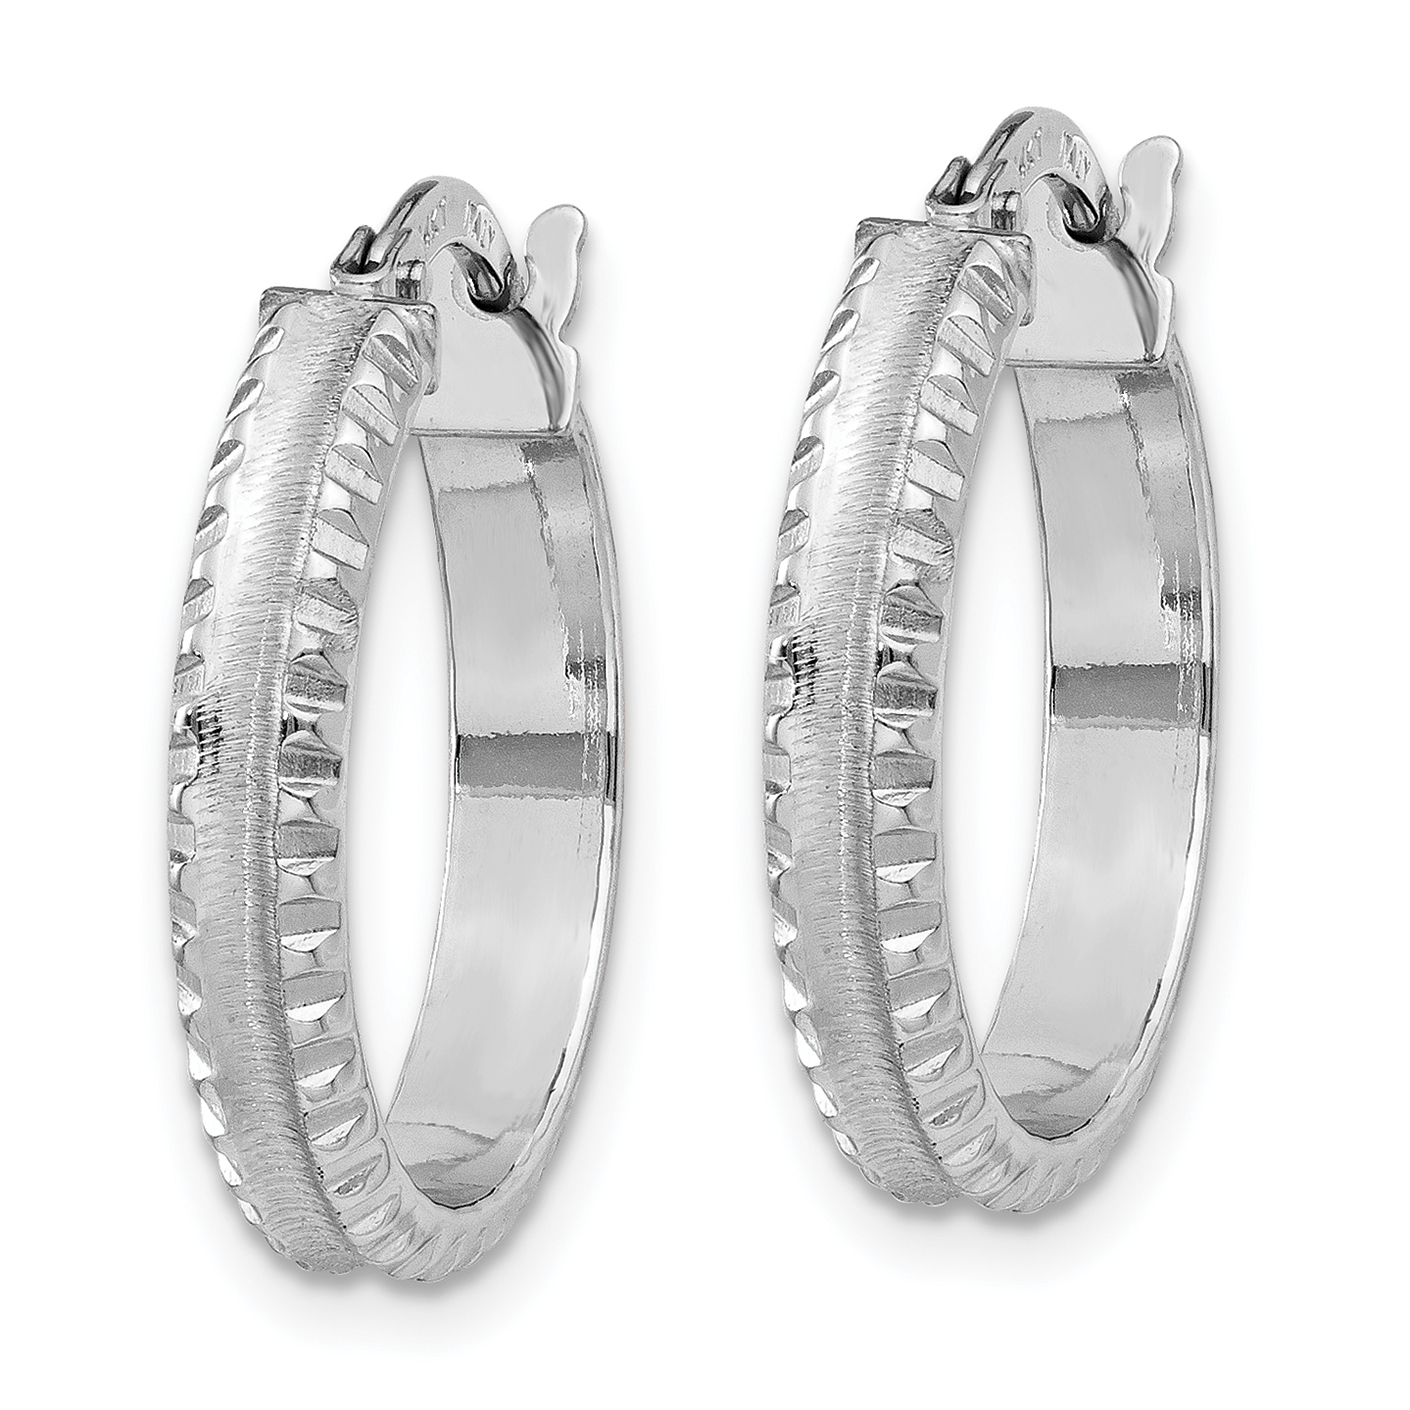 14K White Gold Polished/Satin Ridged Edge Concave Hoop Earrings - image 2 de 4